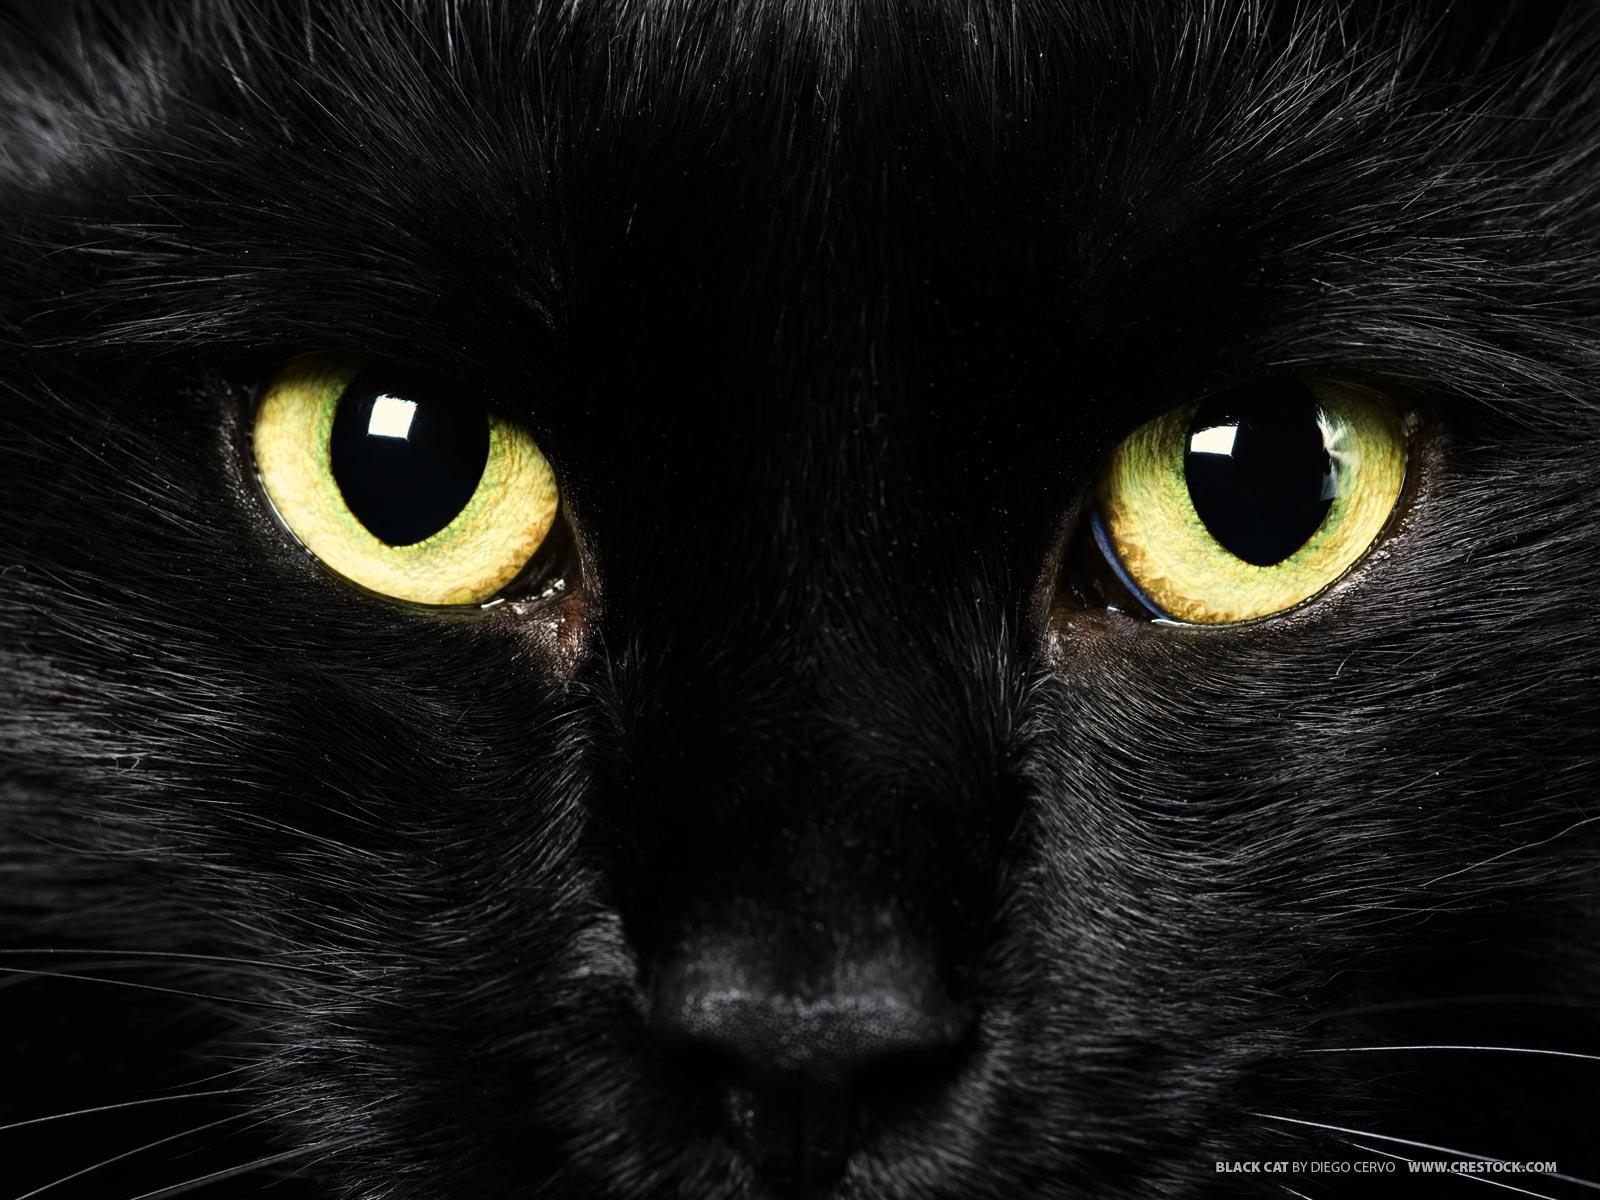 Black Cat Eyes Wallpaper on WallpaperSafari